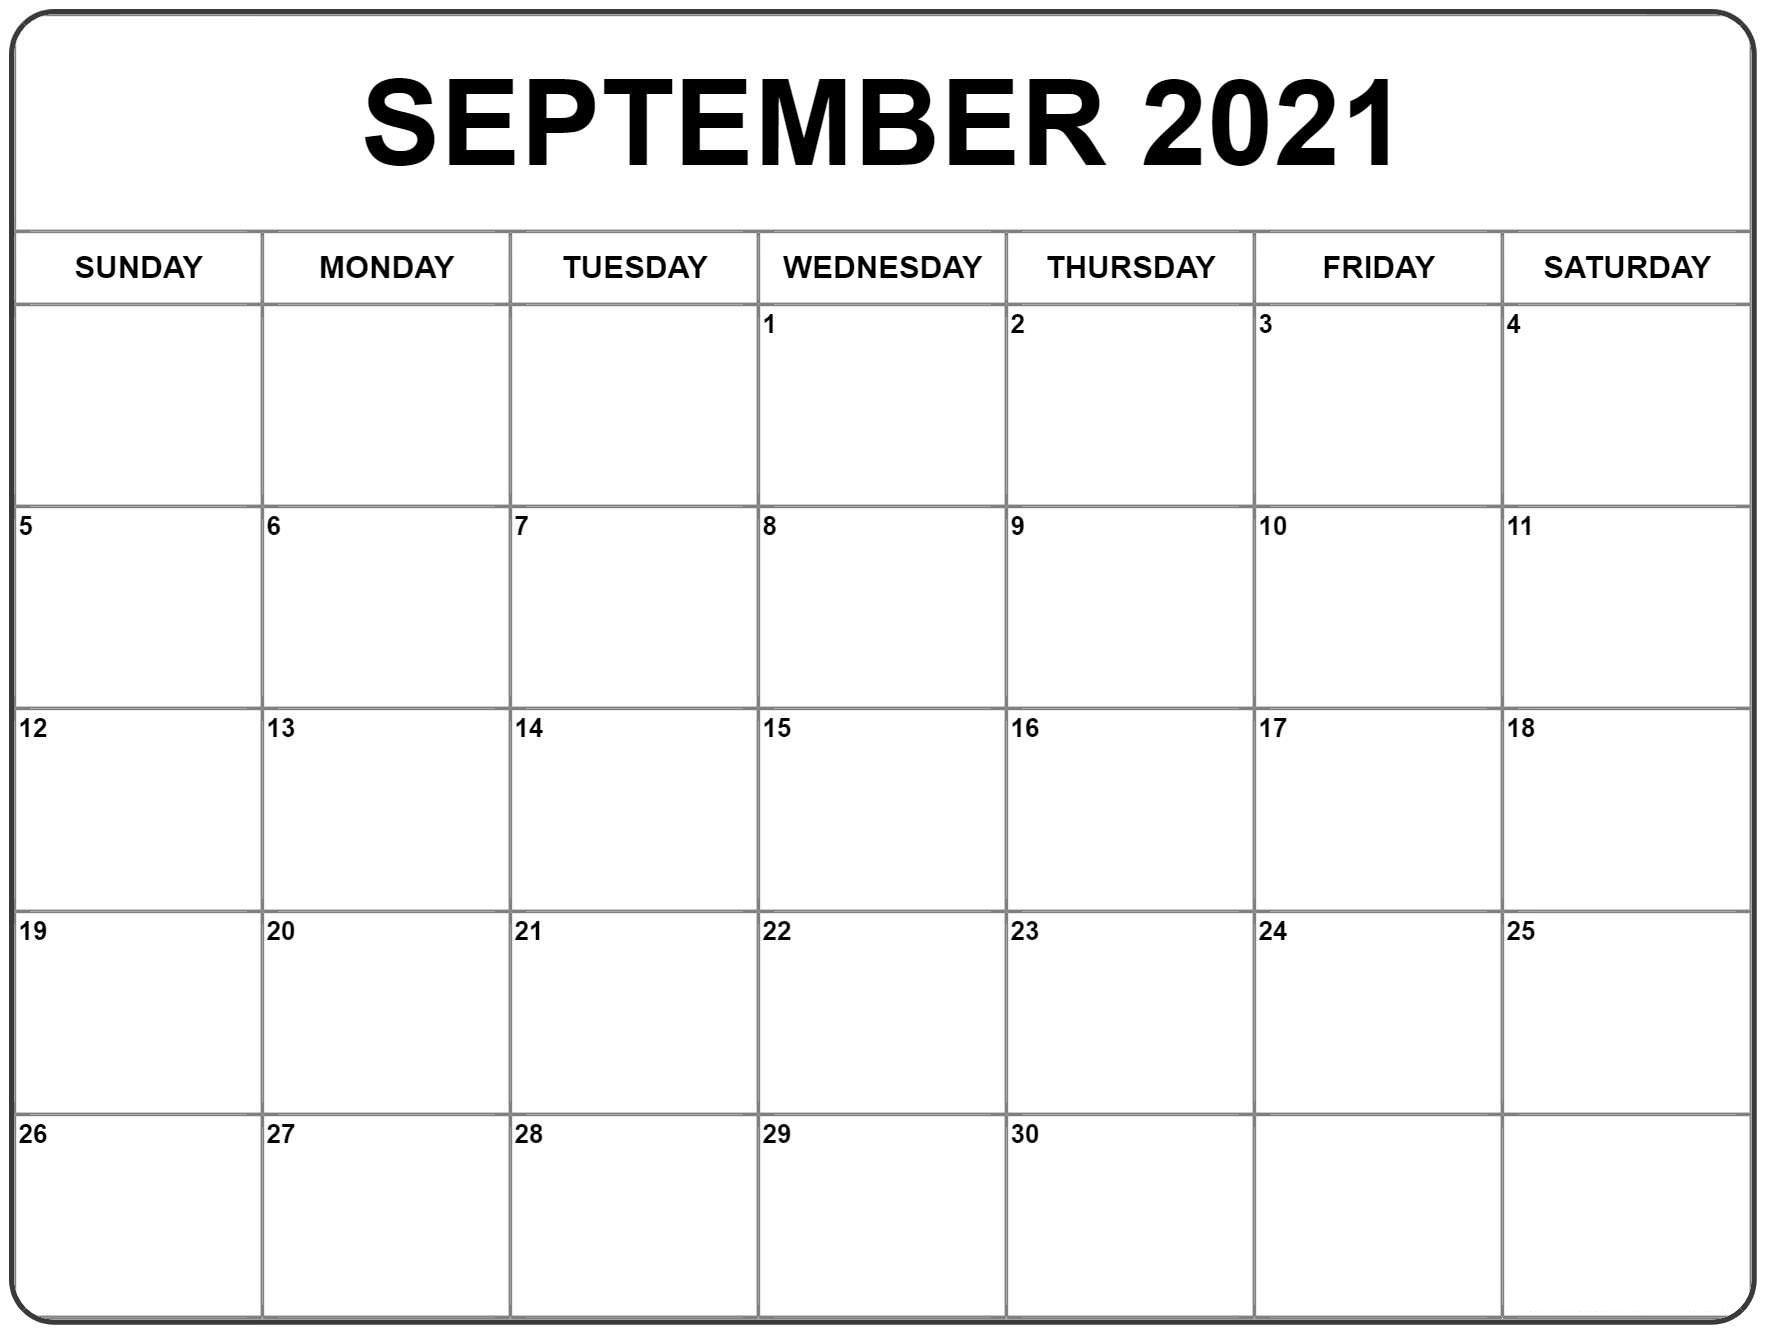 September 2021 Calendar | Monthly Calendar Printable, Blank